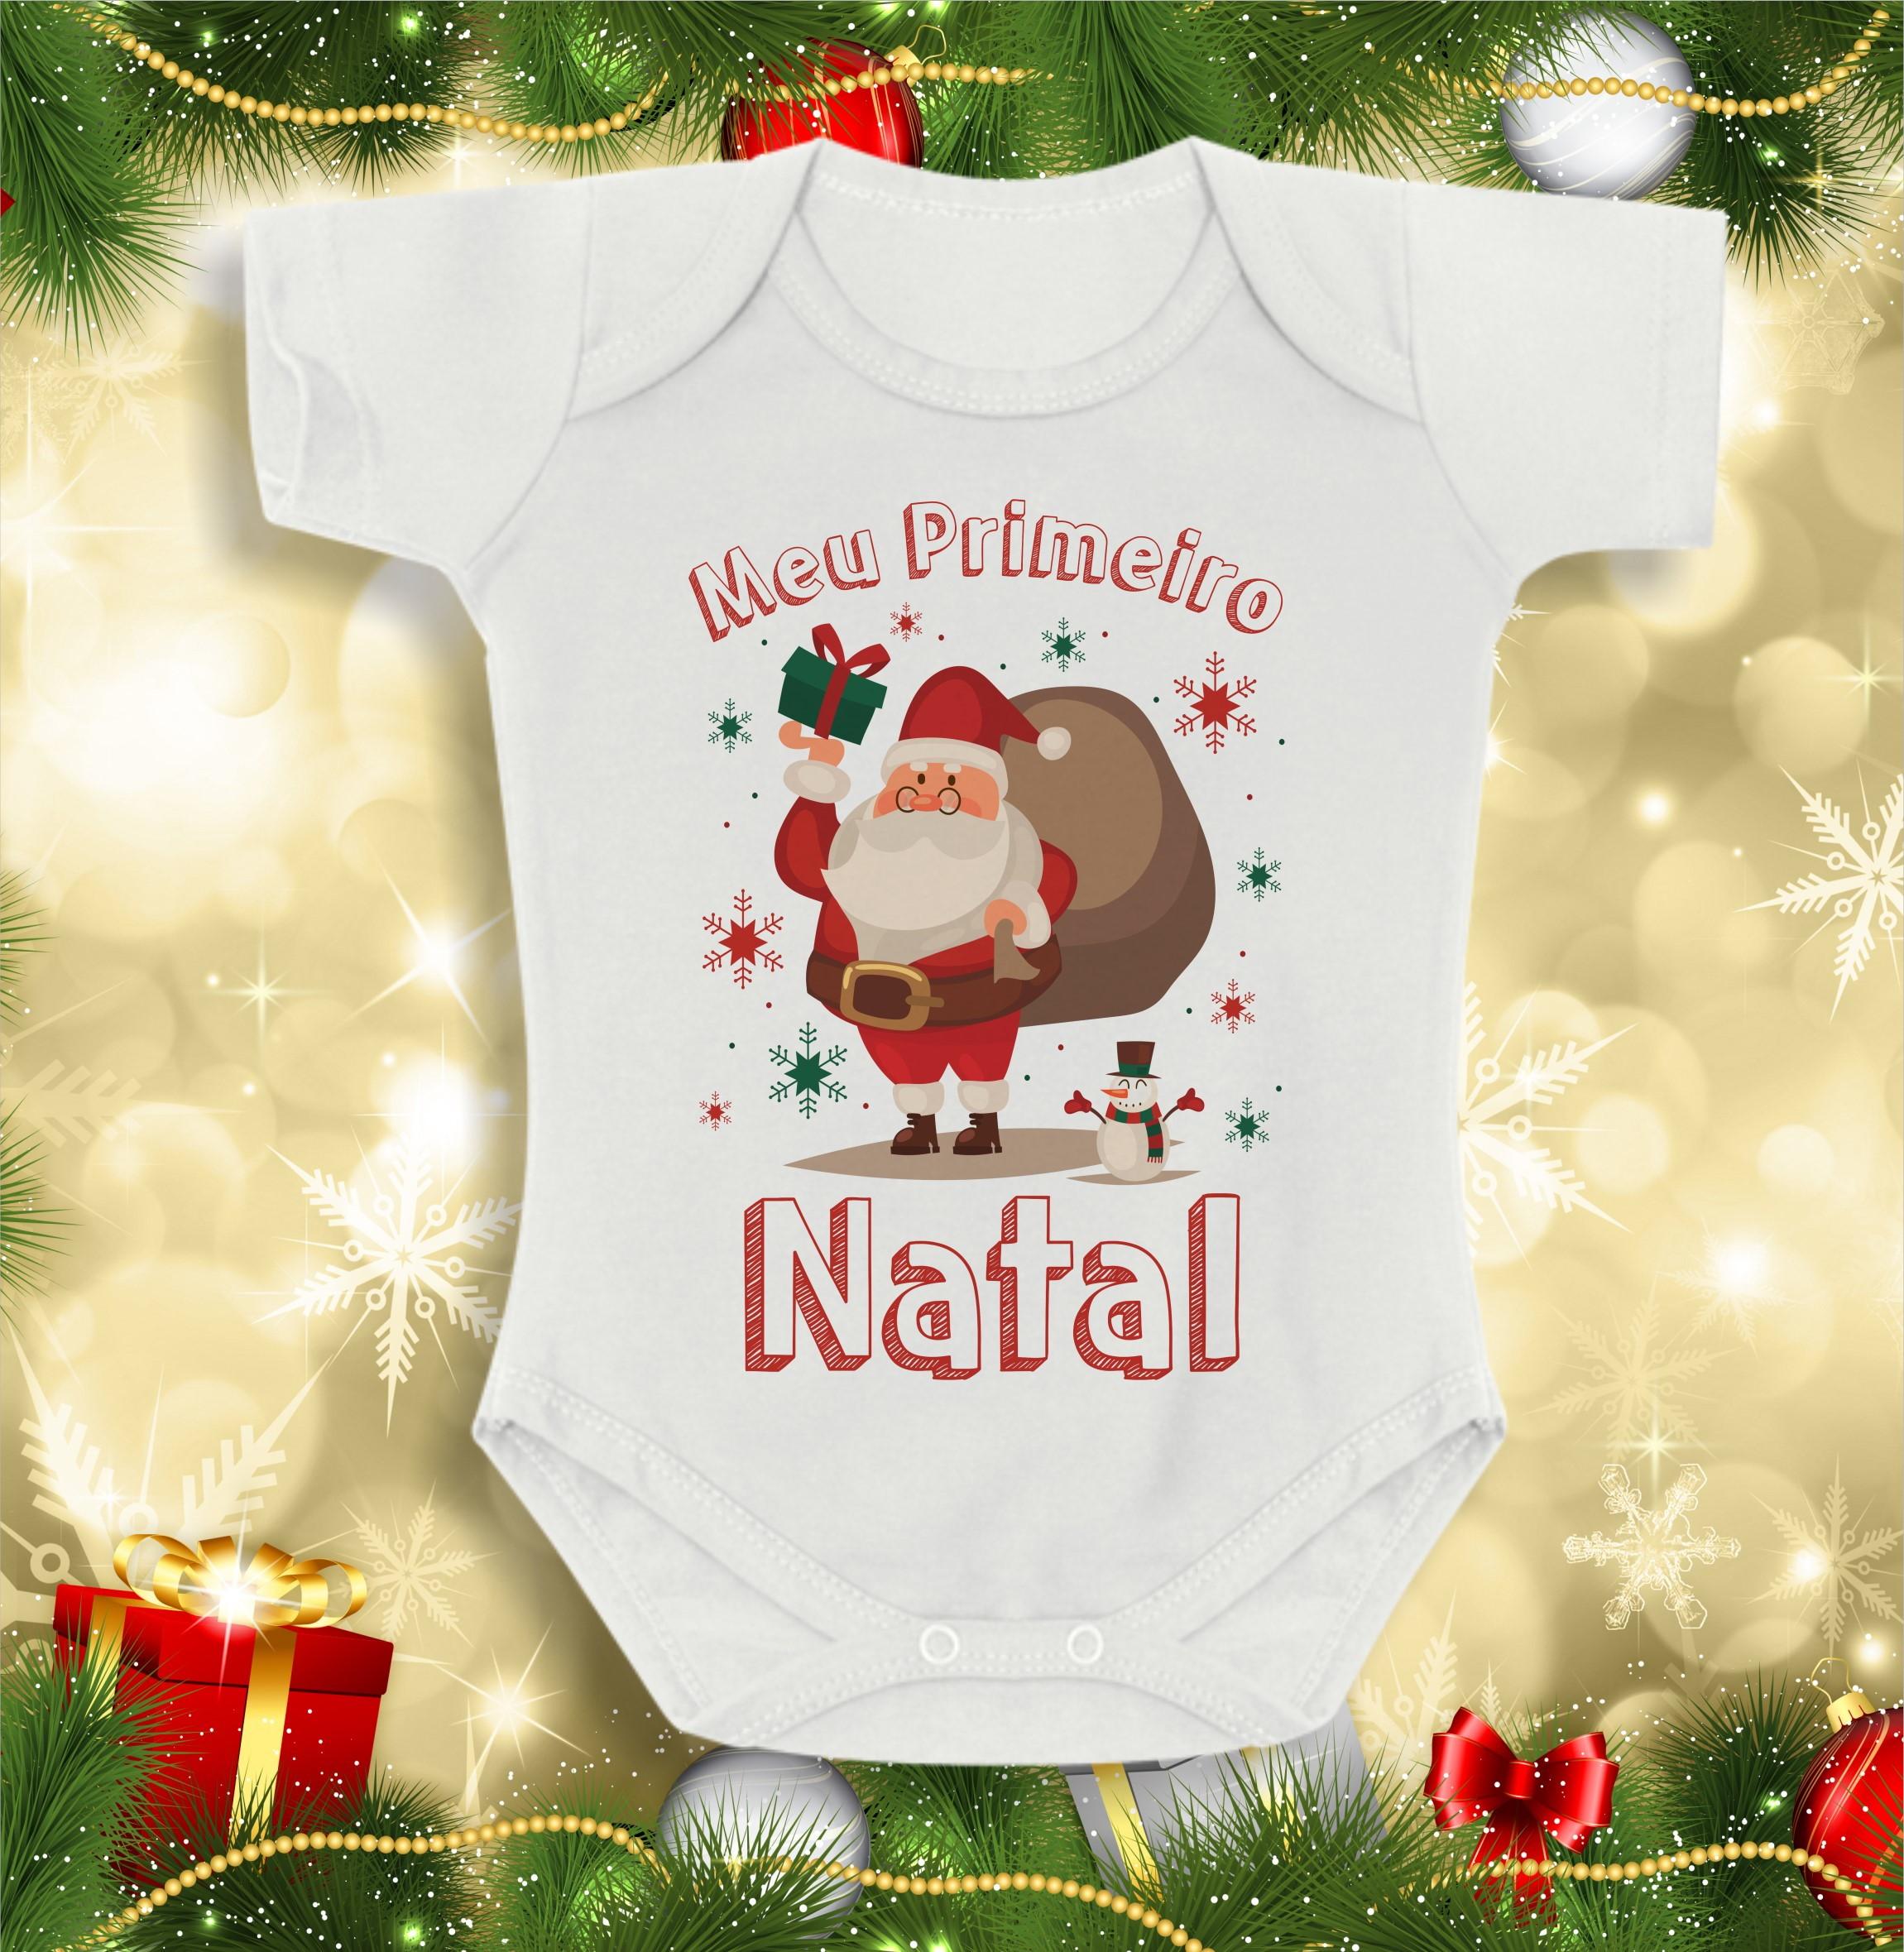 8c4a449935 Body Infantil Meu Primeiro Natal Bebê Papai Noel tip top no Elo7 ...